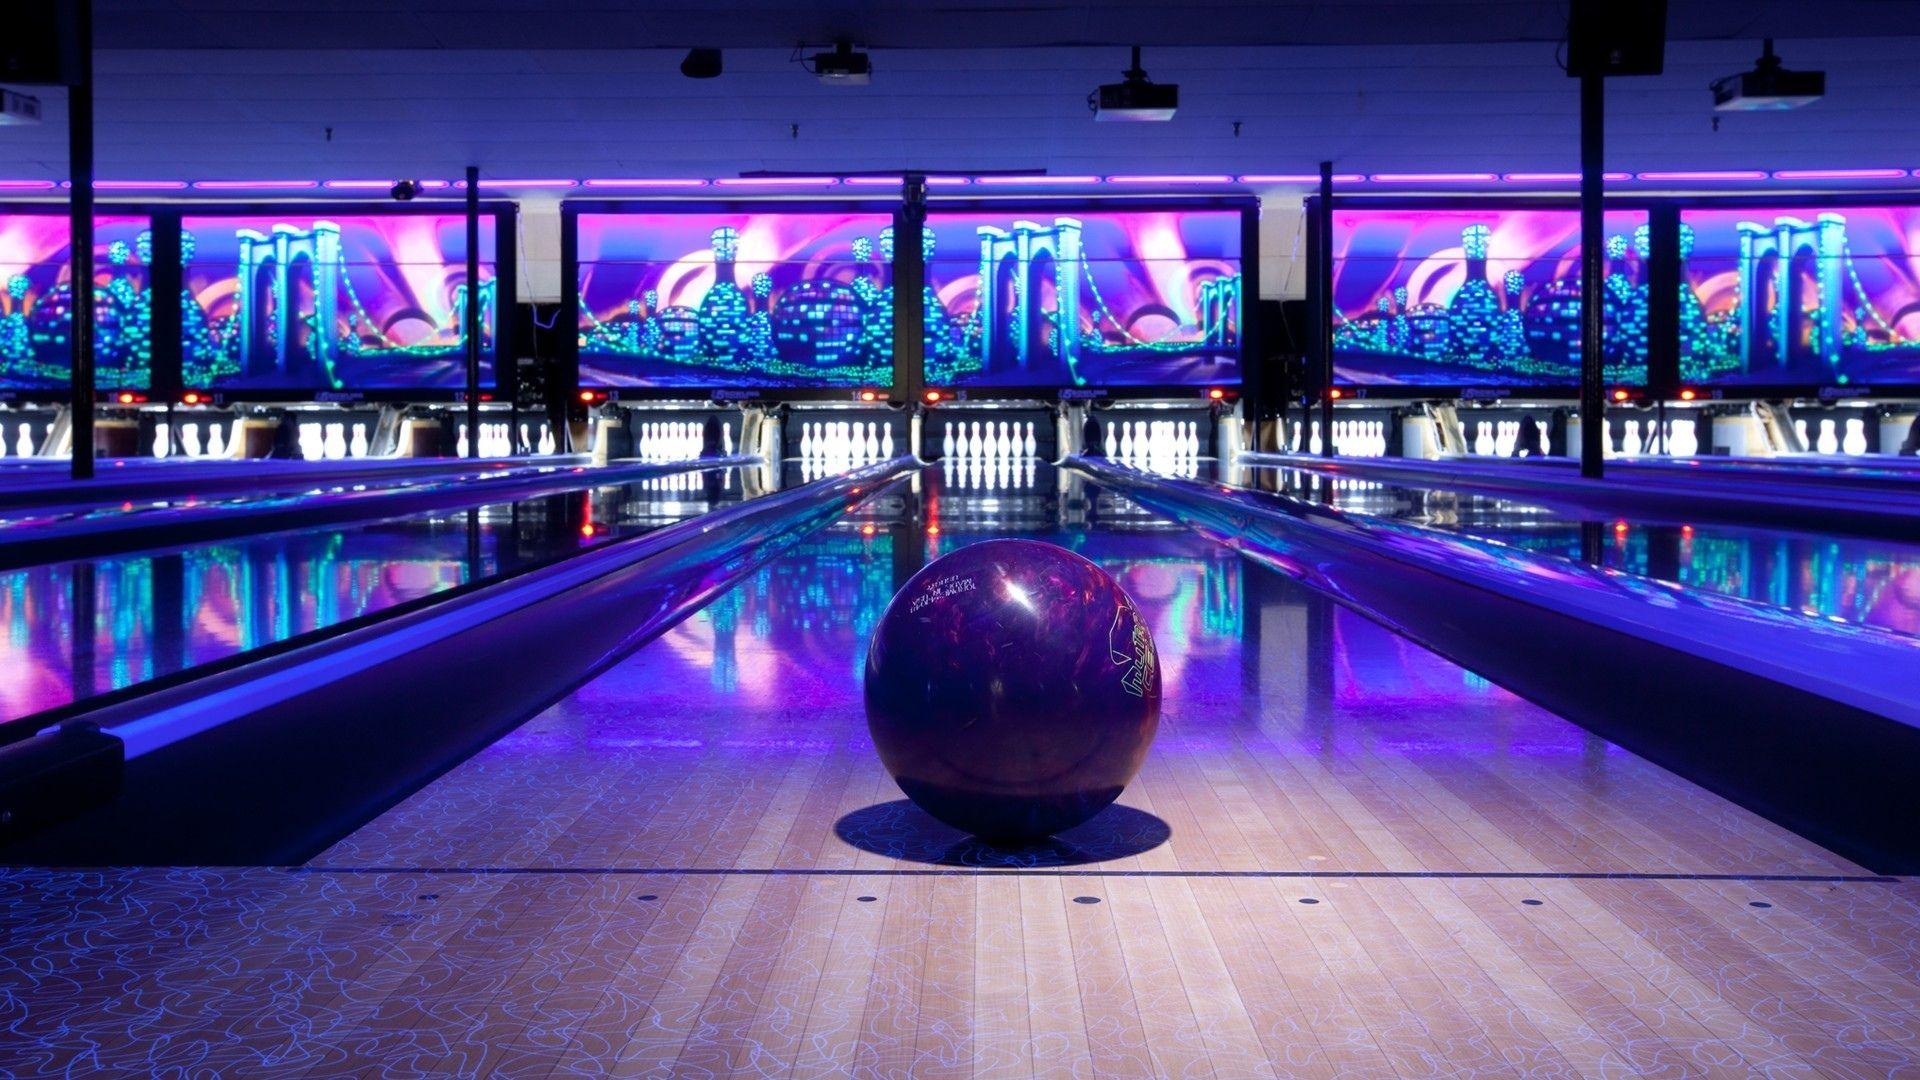 380057 Jpg 1920 1080 Cosmic Bowling Bowling Amf Bowling